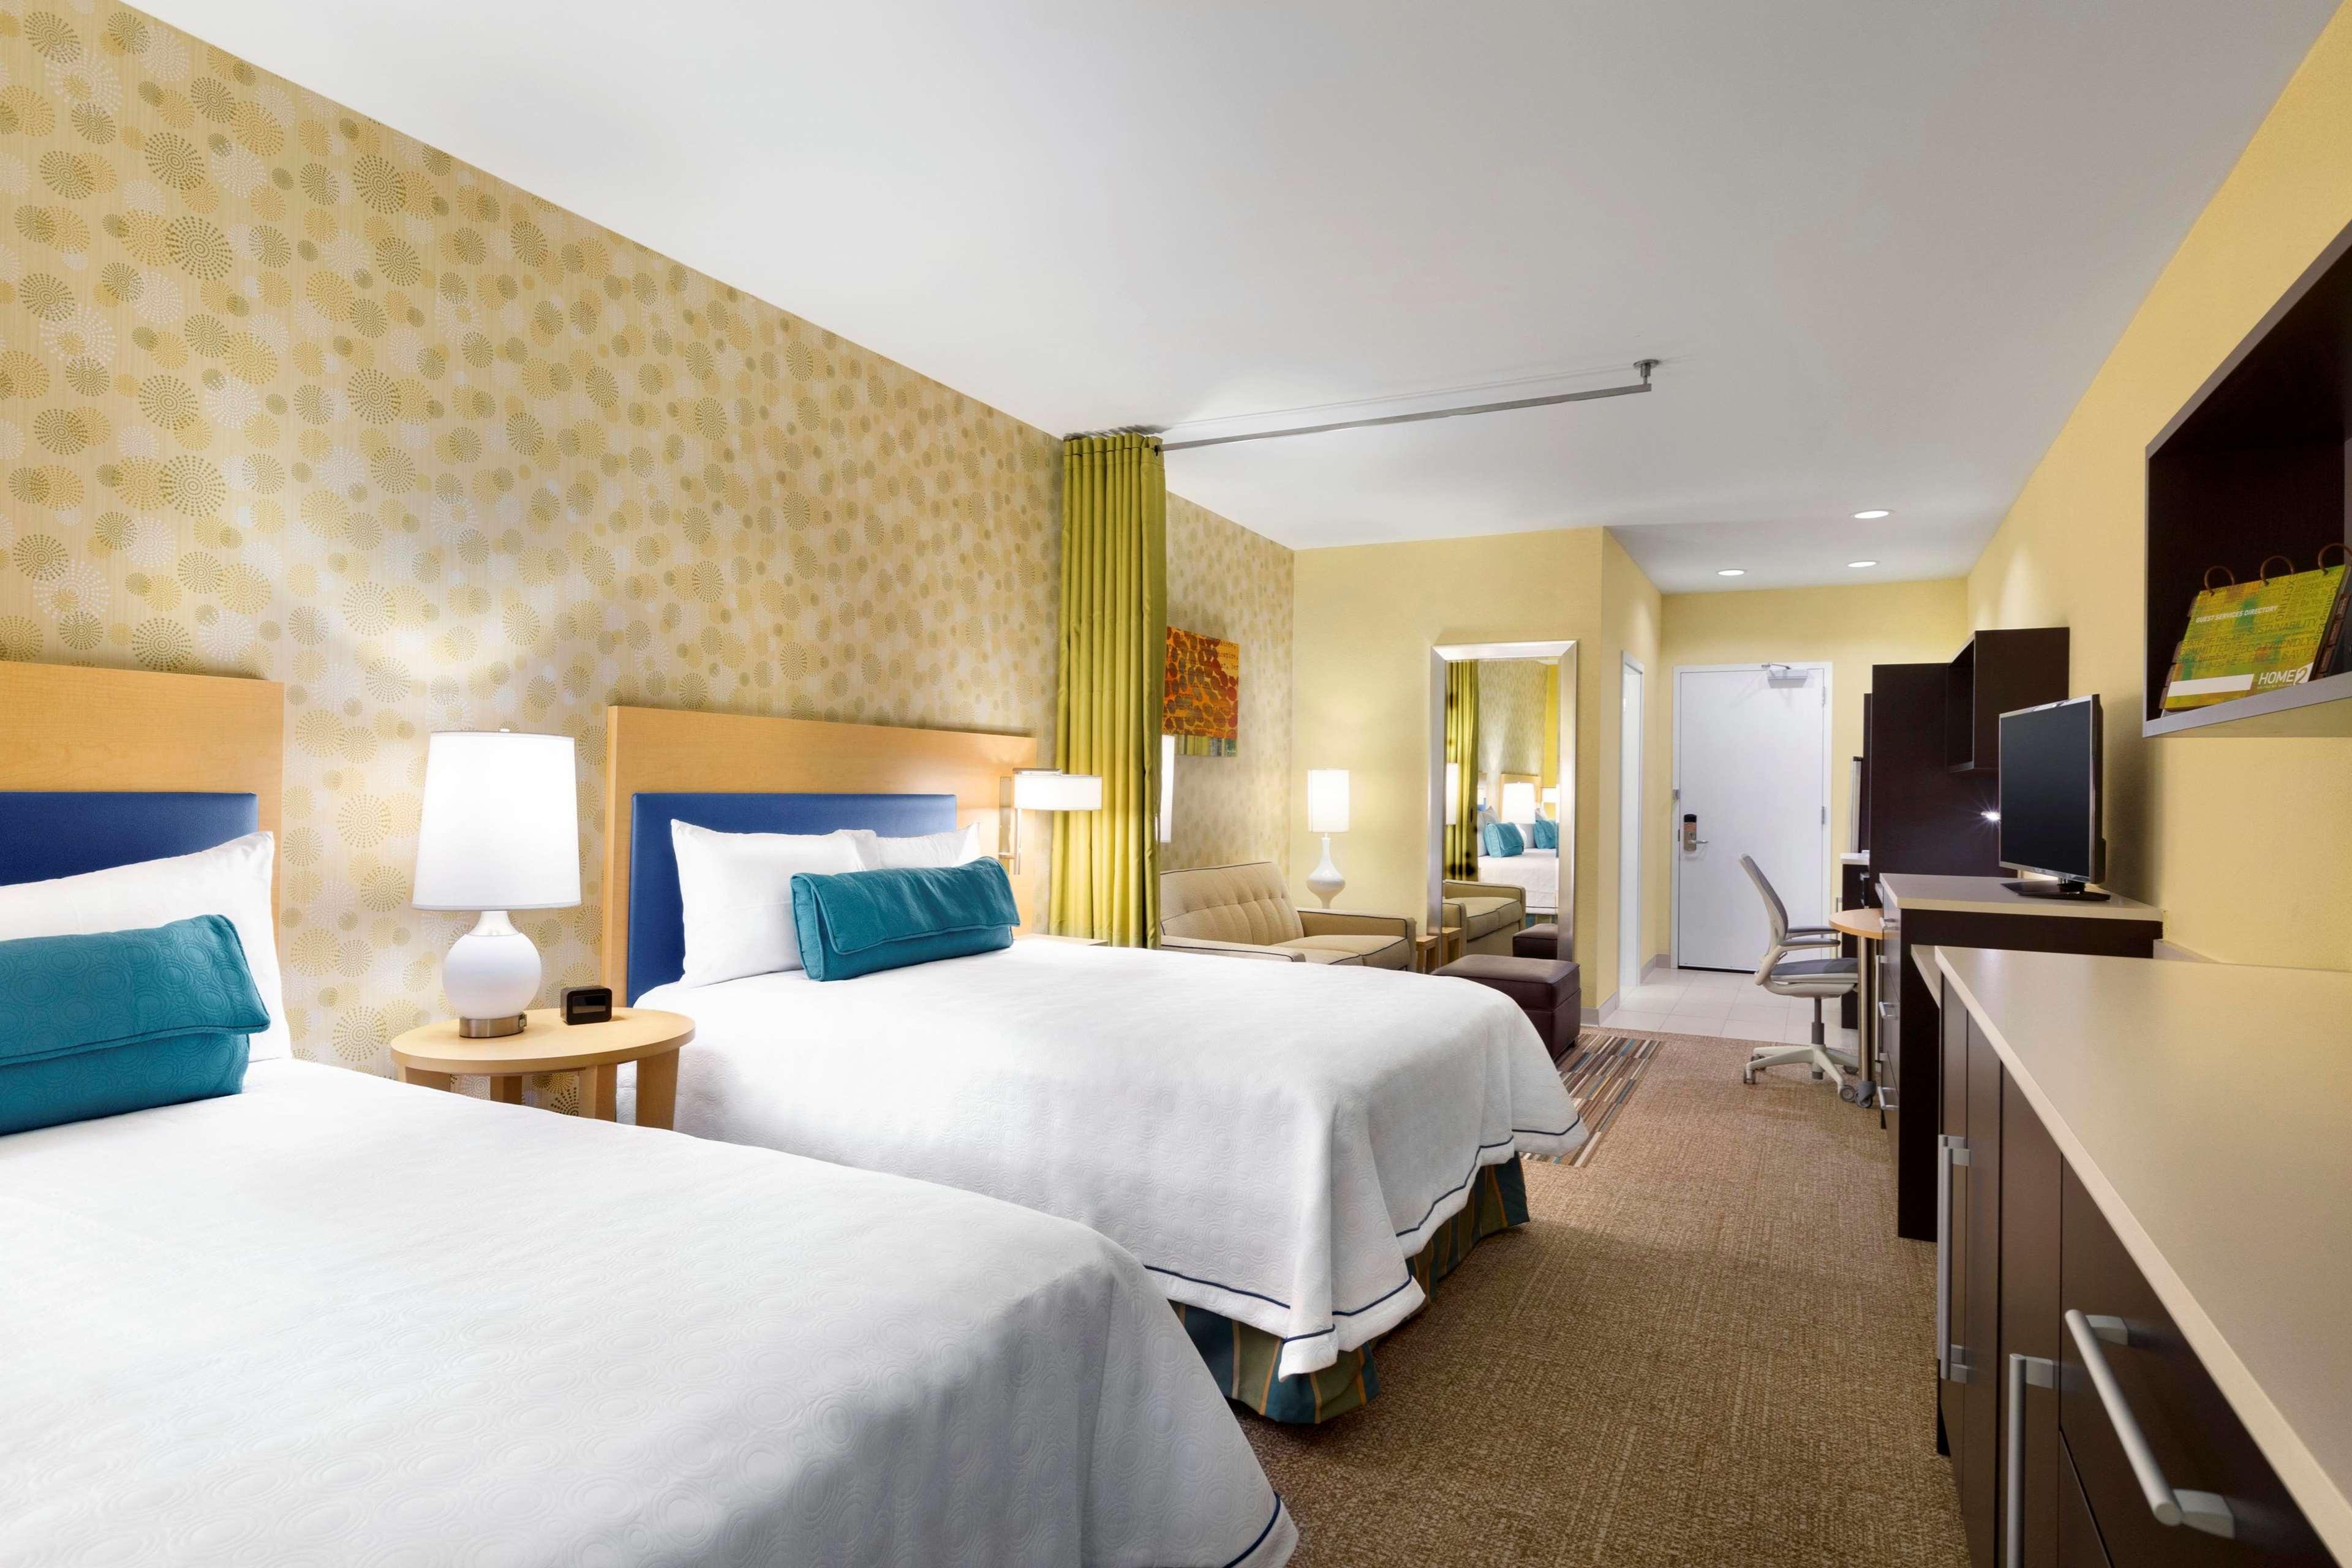 Home2 Suites by Hilton Houston Pasadena image 19